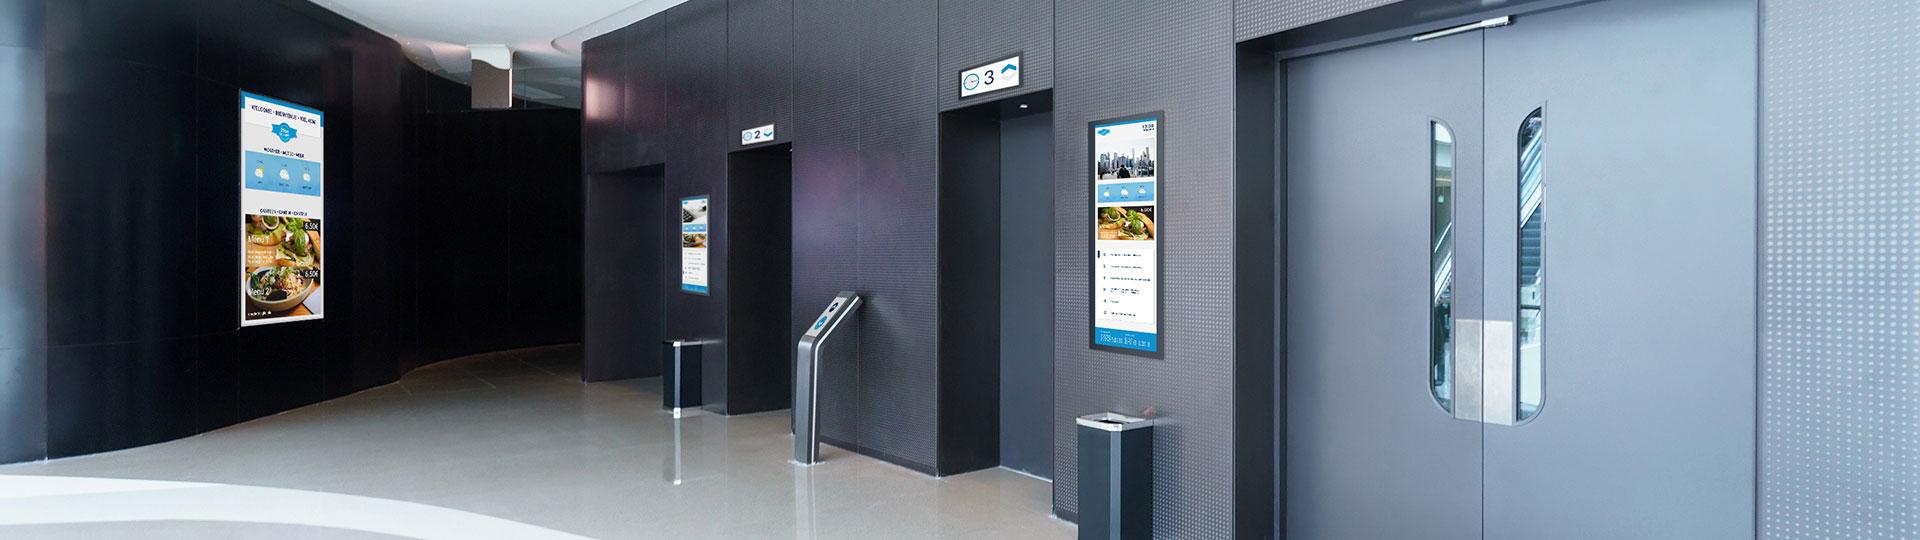 Displays in Bürogebäuden